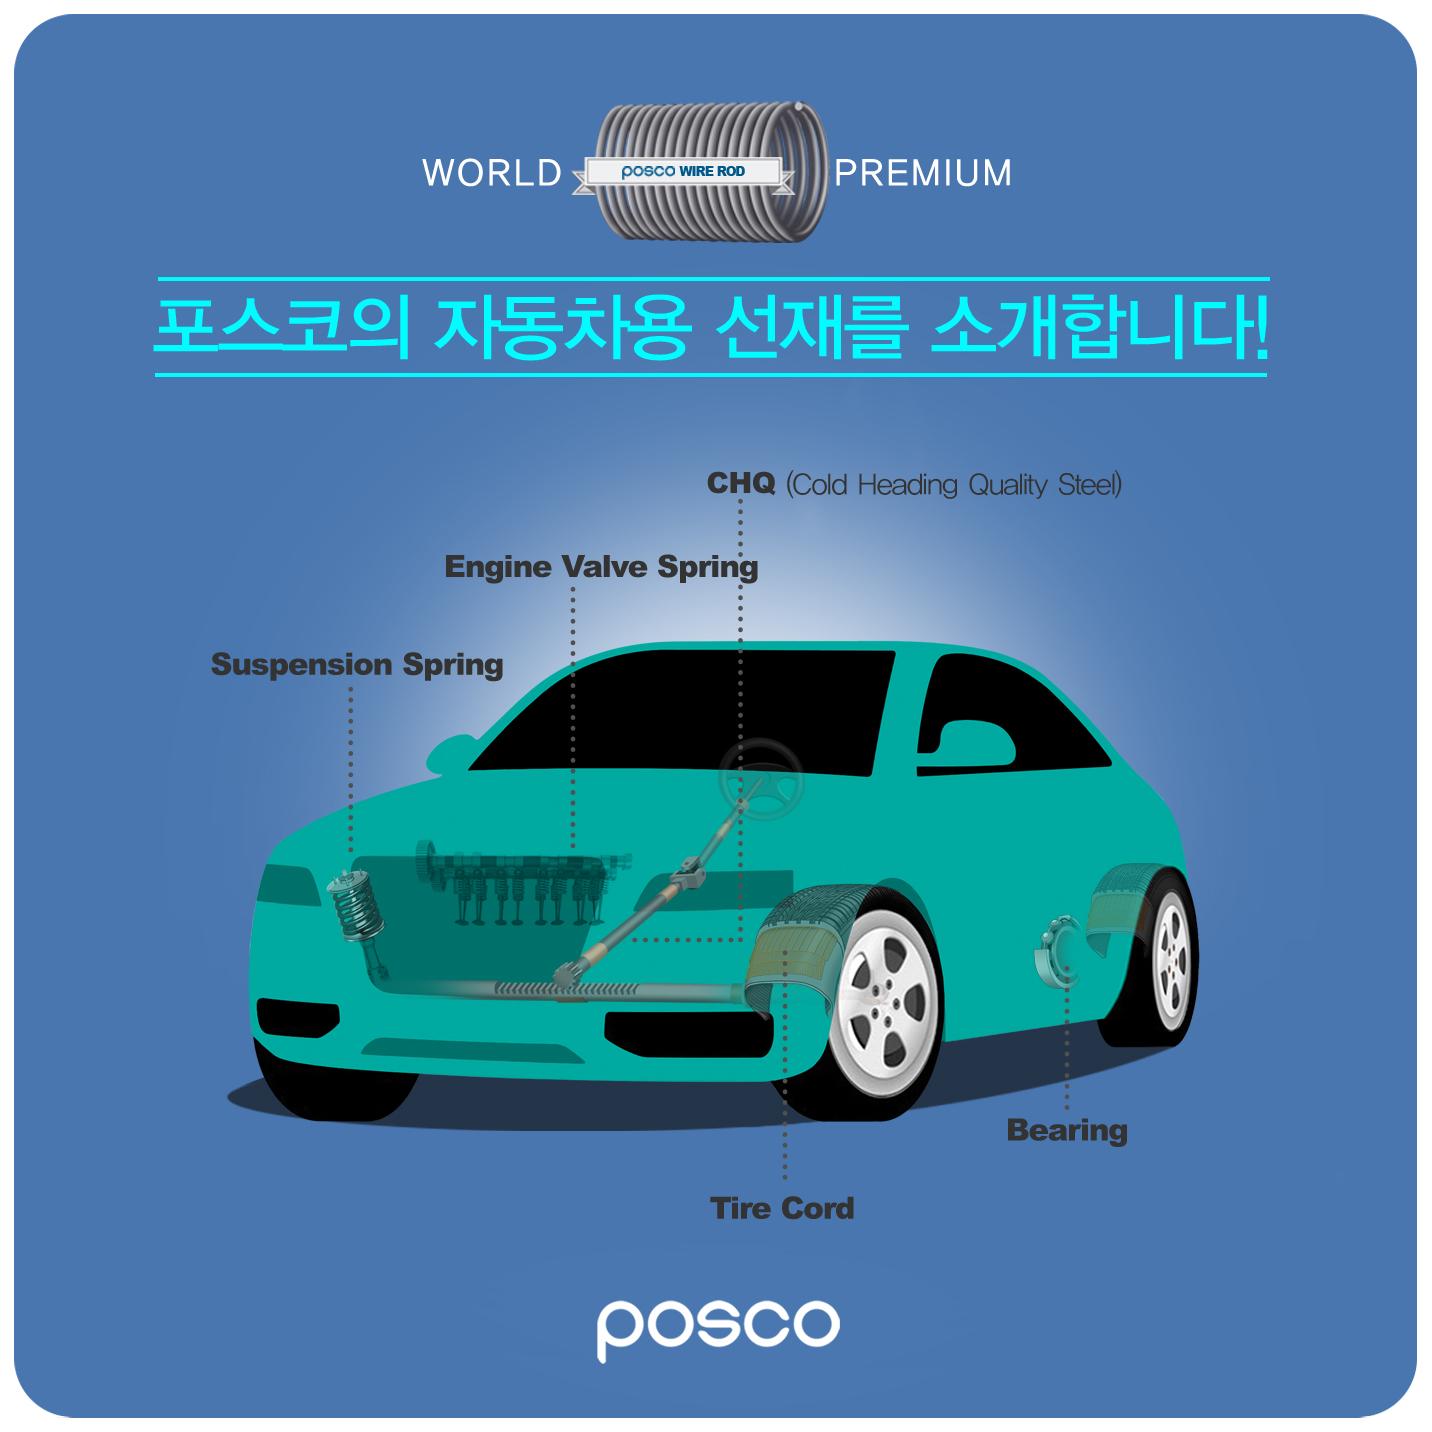 world premium 포스코의 자동차용 선재를 소개합니다 CHQ(Cold Heading Quality Steel) Engine Valve Spring Suspension Spring Bearing Tire Cord posco